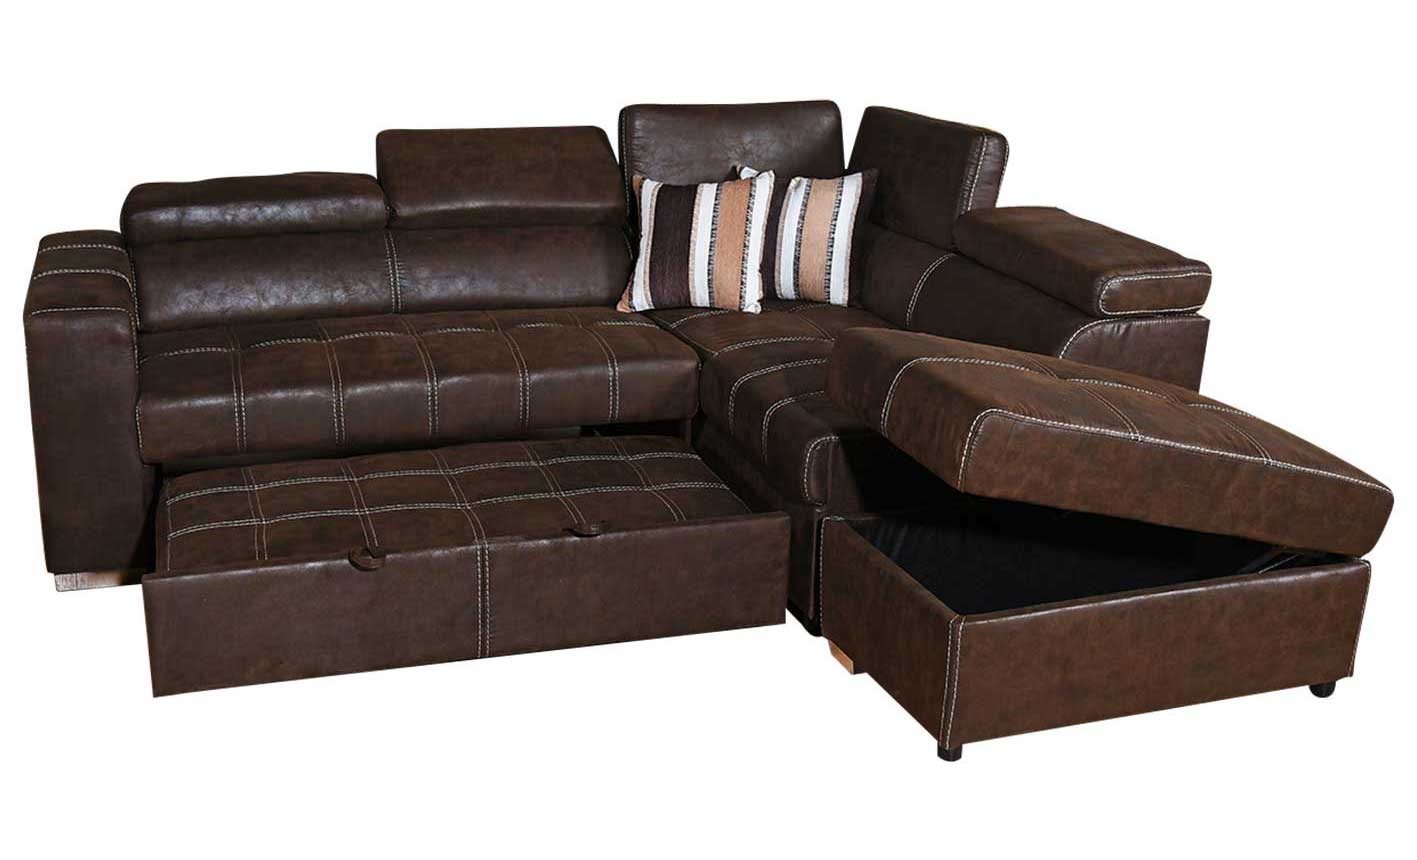 Corner Sleeper Couch